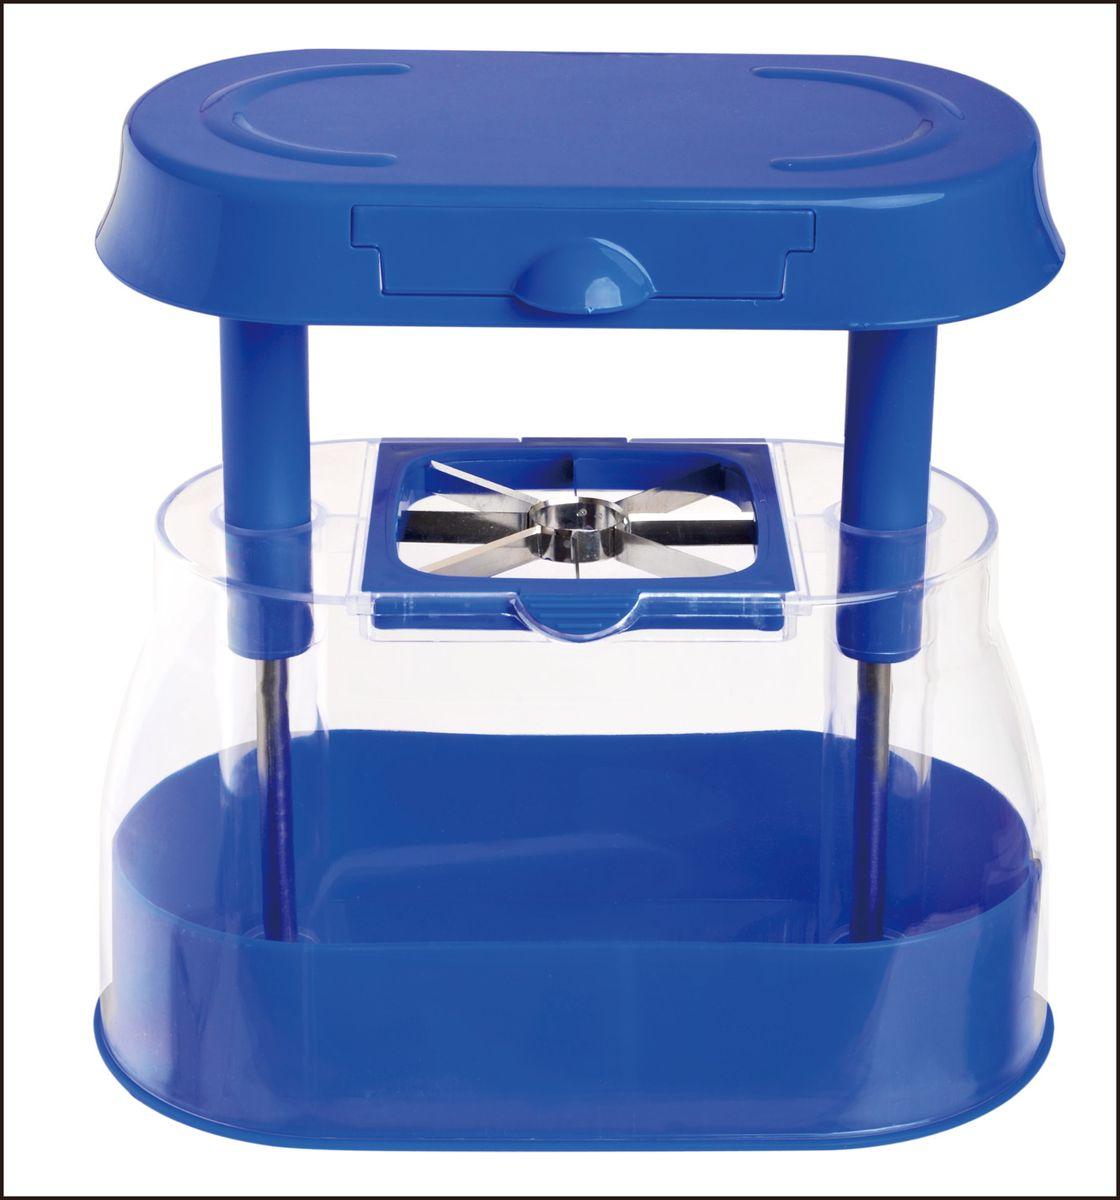 Фото - Овощерезка As Seen On TV Multi Chopper, цвет: синий экспресс овощерезка as seen on tv идеальные кубики и ломтики